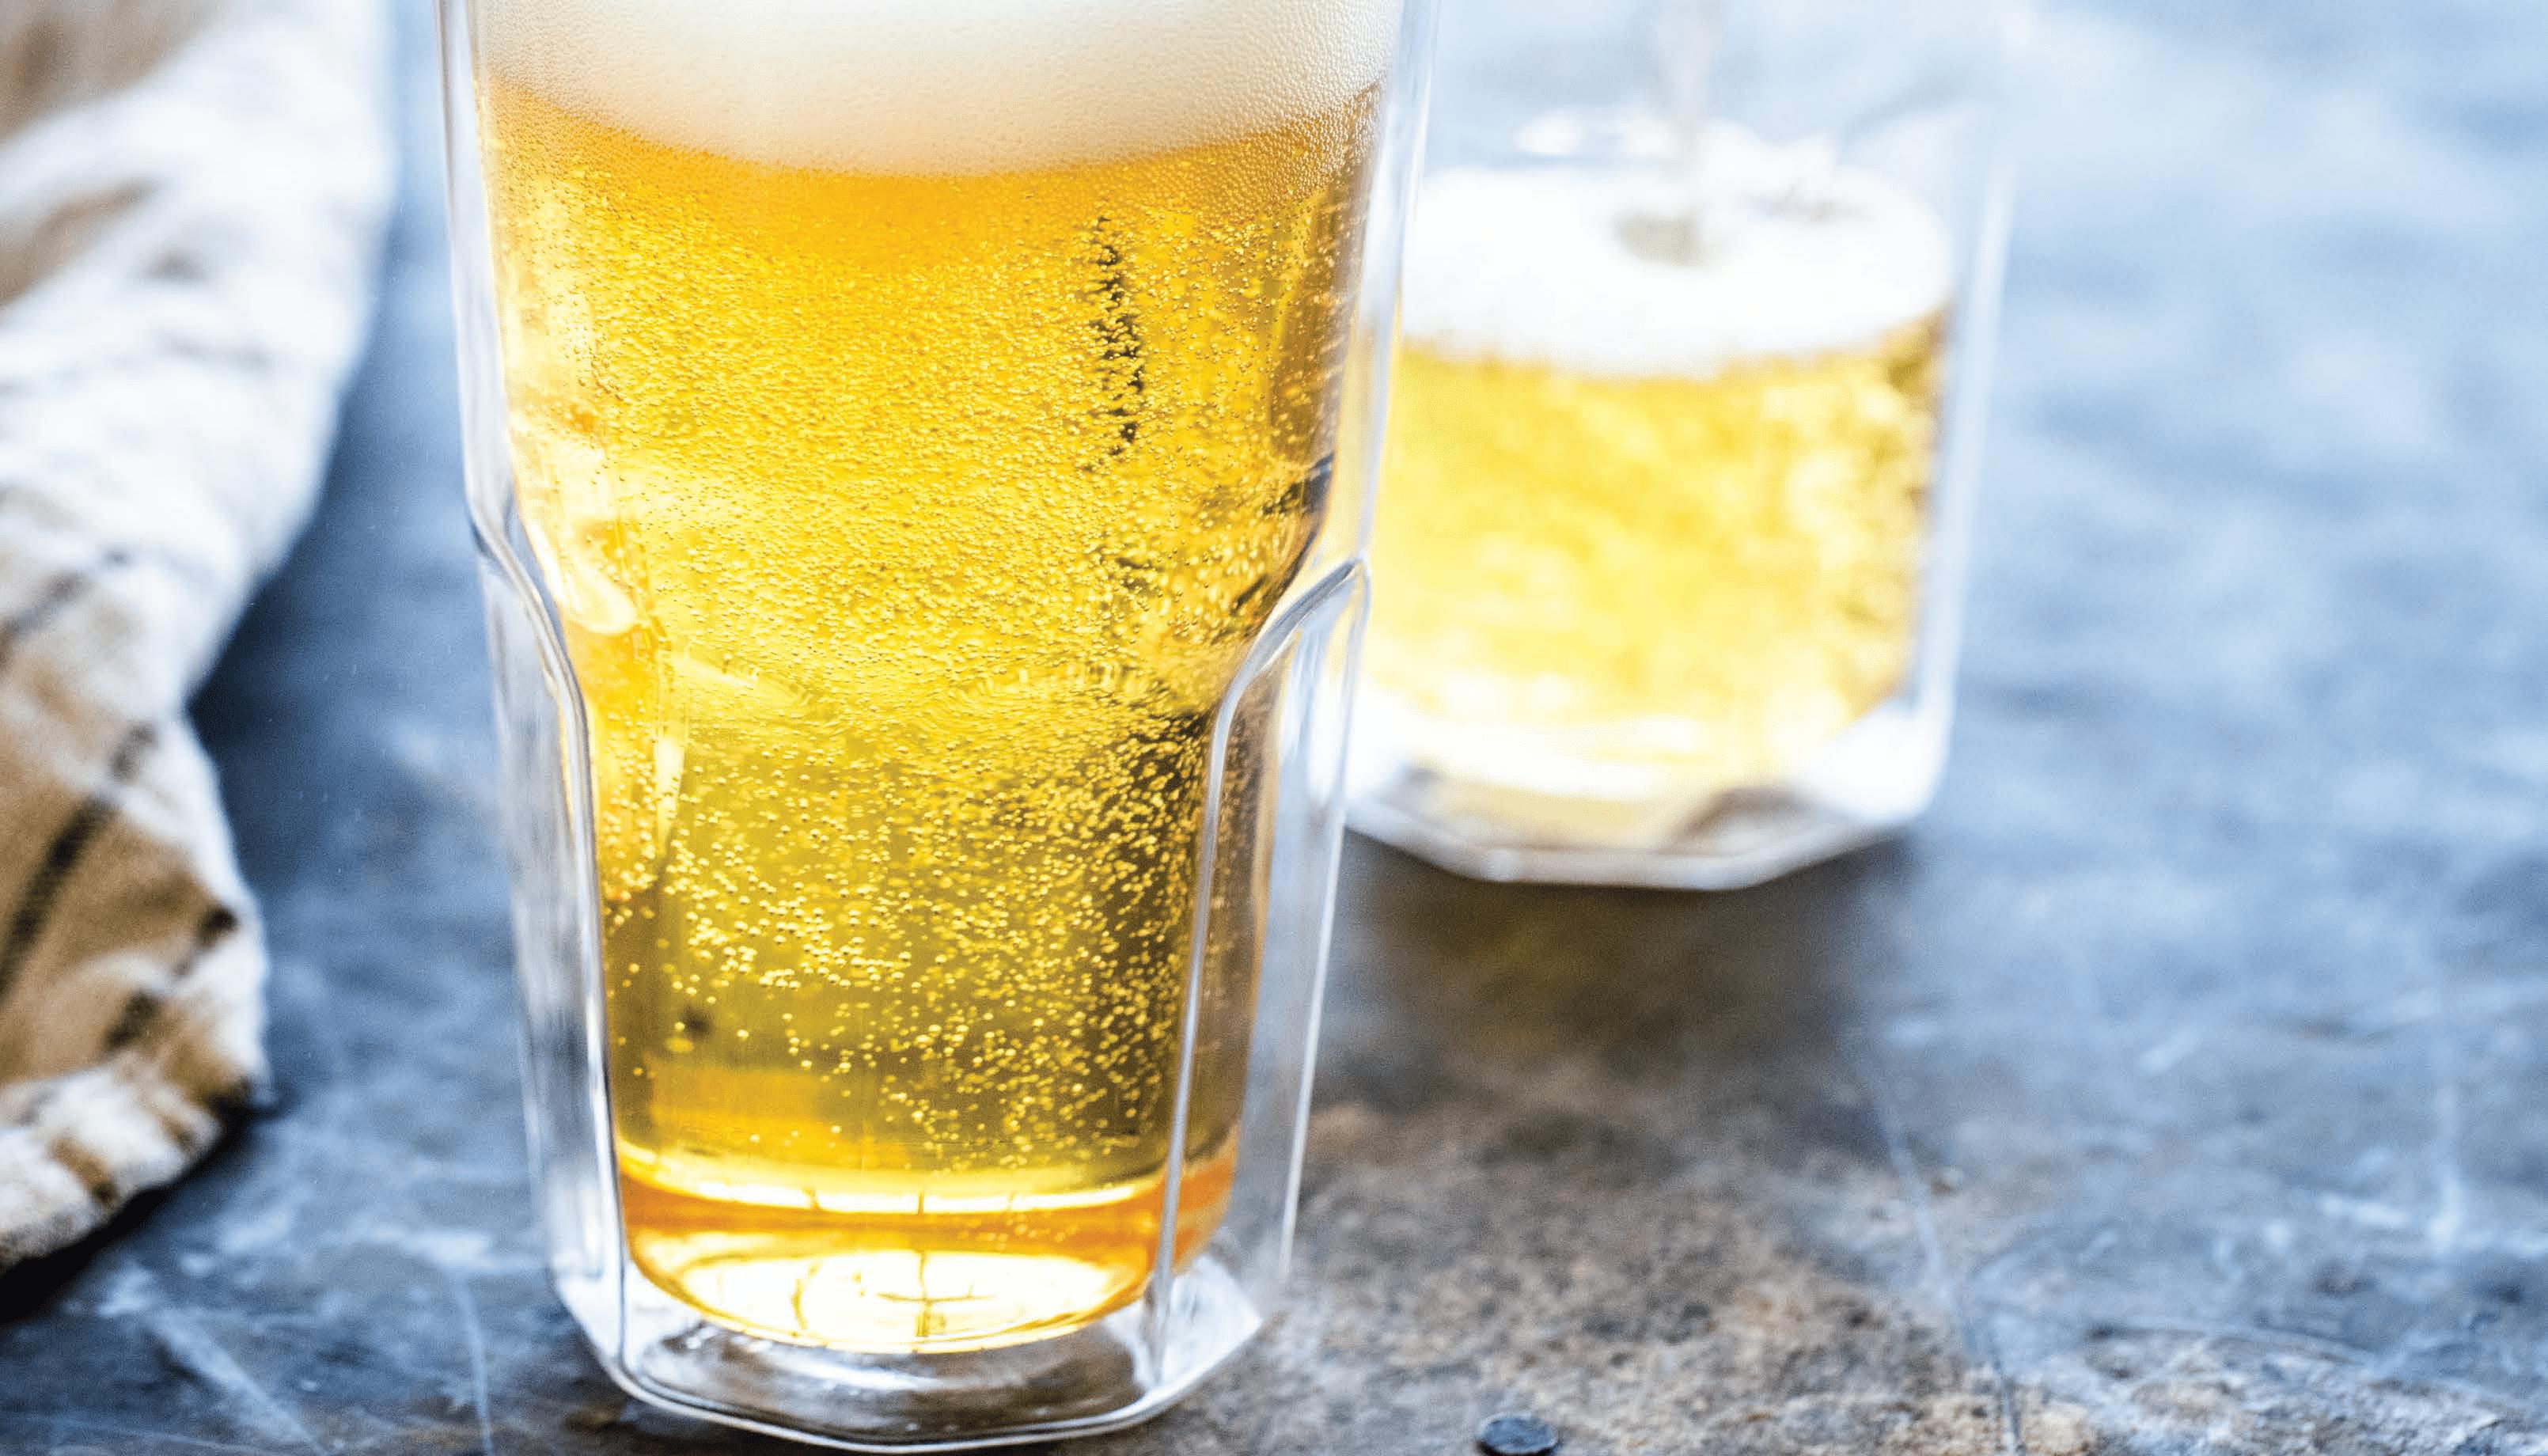 Basic Apple Cider | The Splendid Table